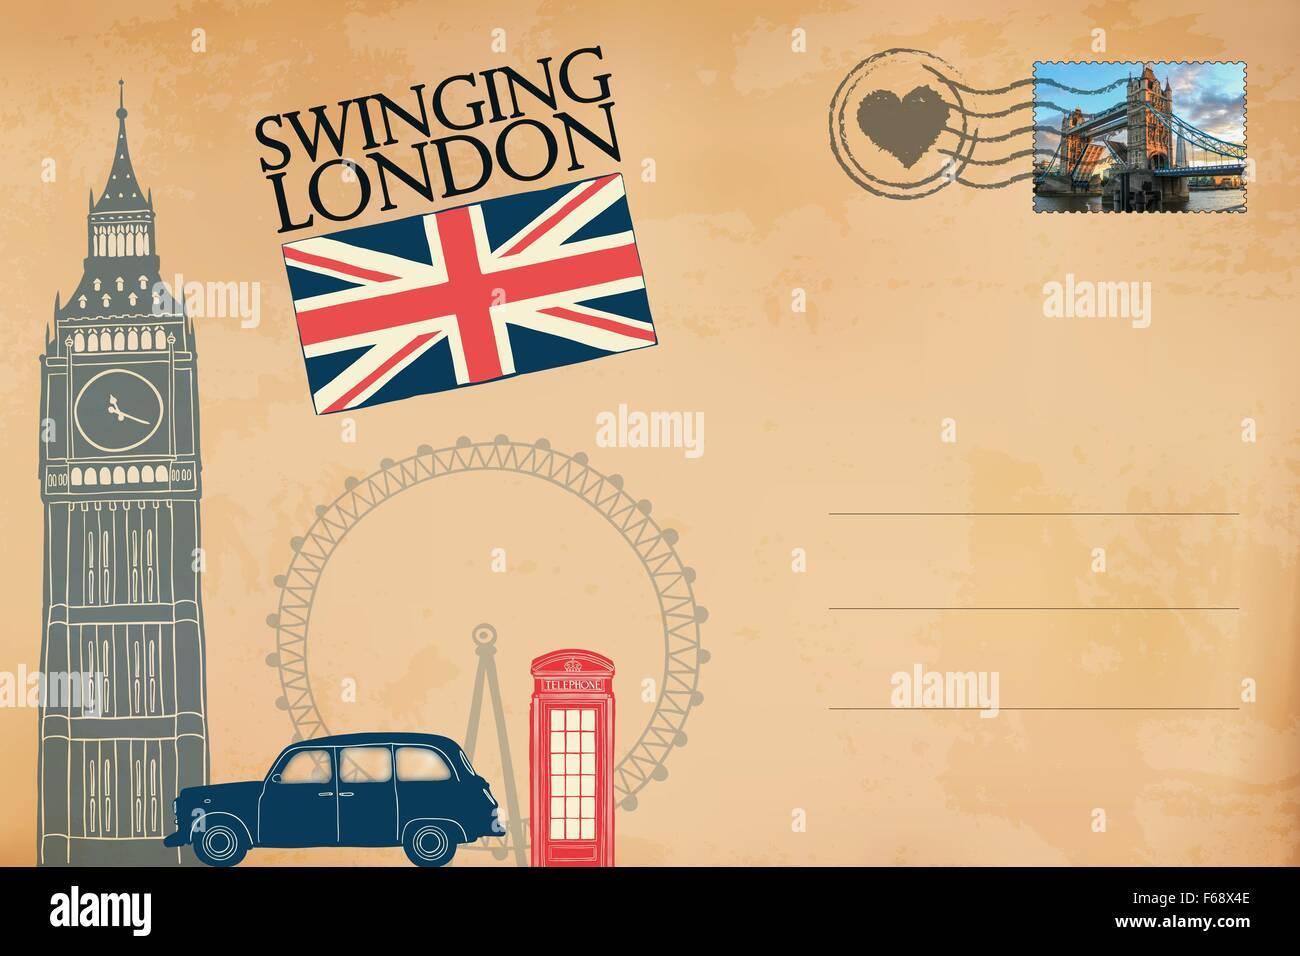 London postcard stock photo royalty free image 89935902 alamy